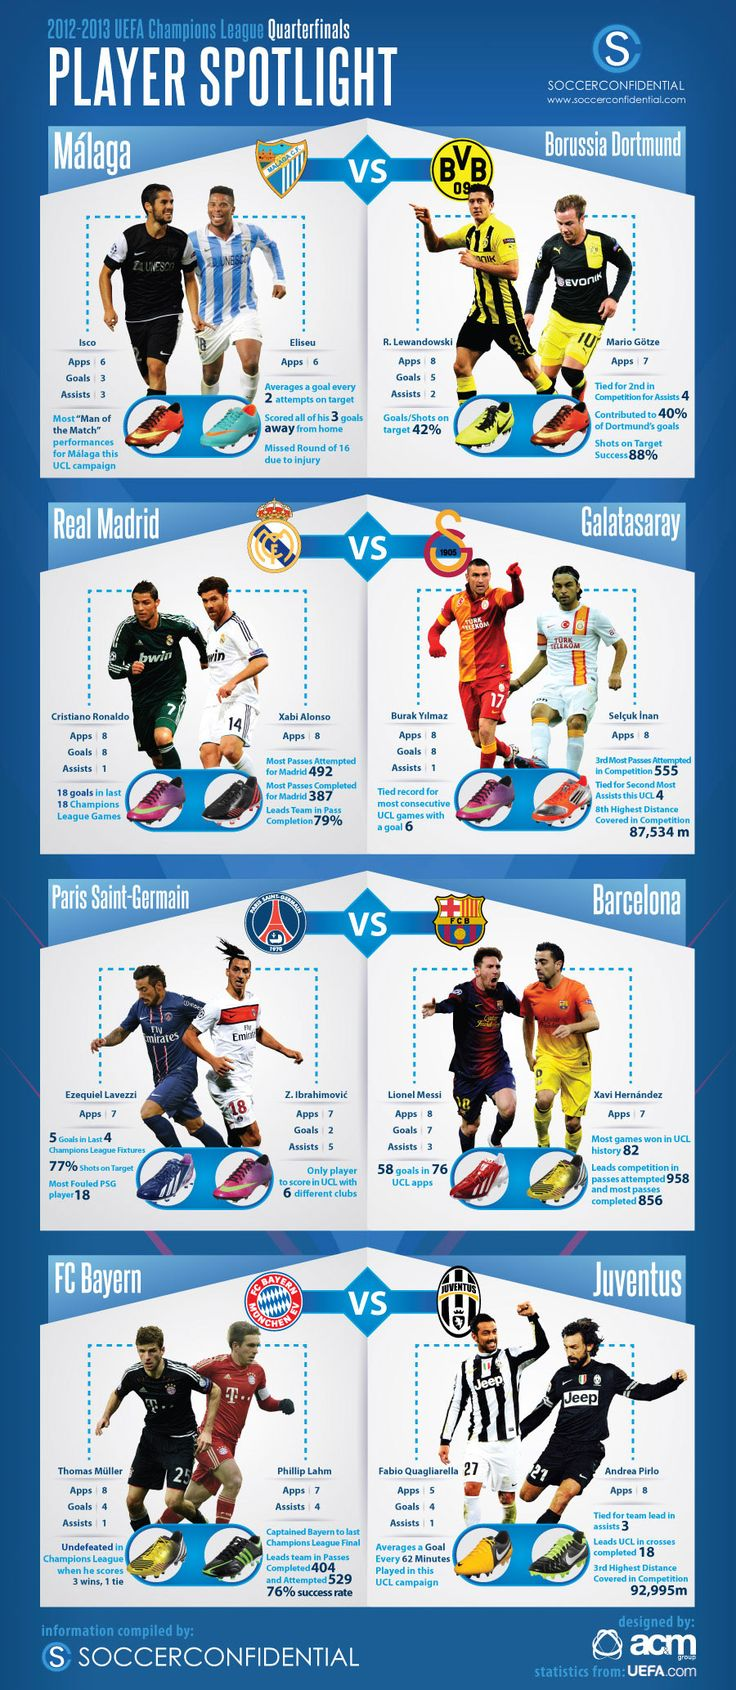 Champions League Quarterfinals - Player Spotlight